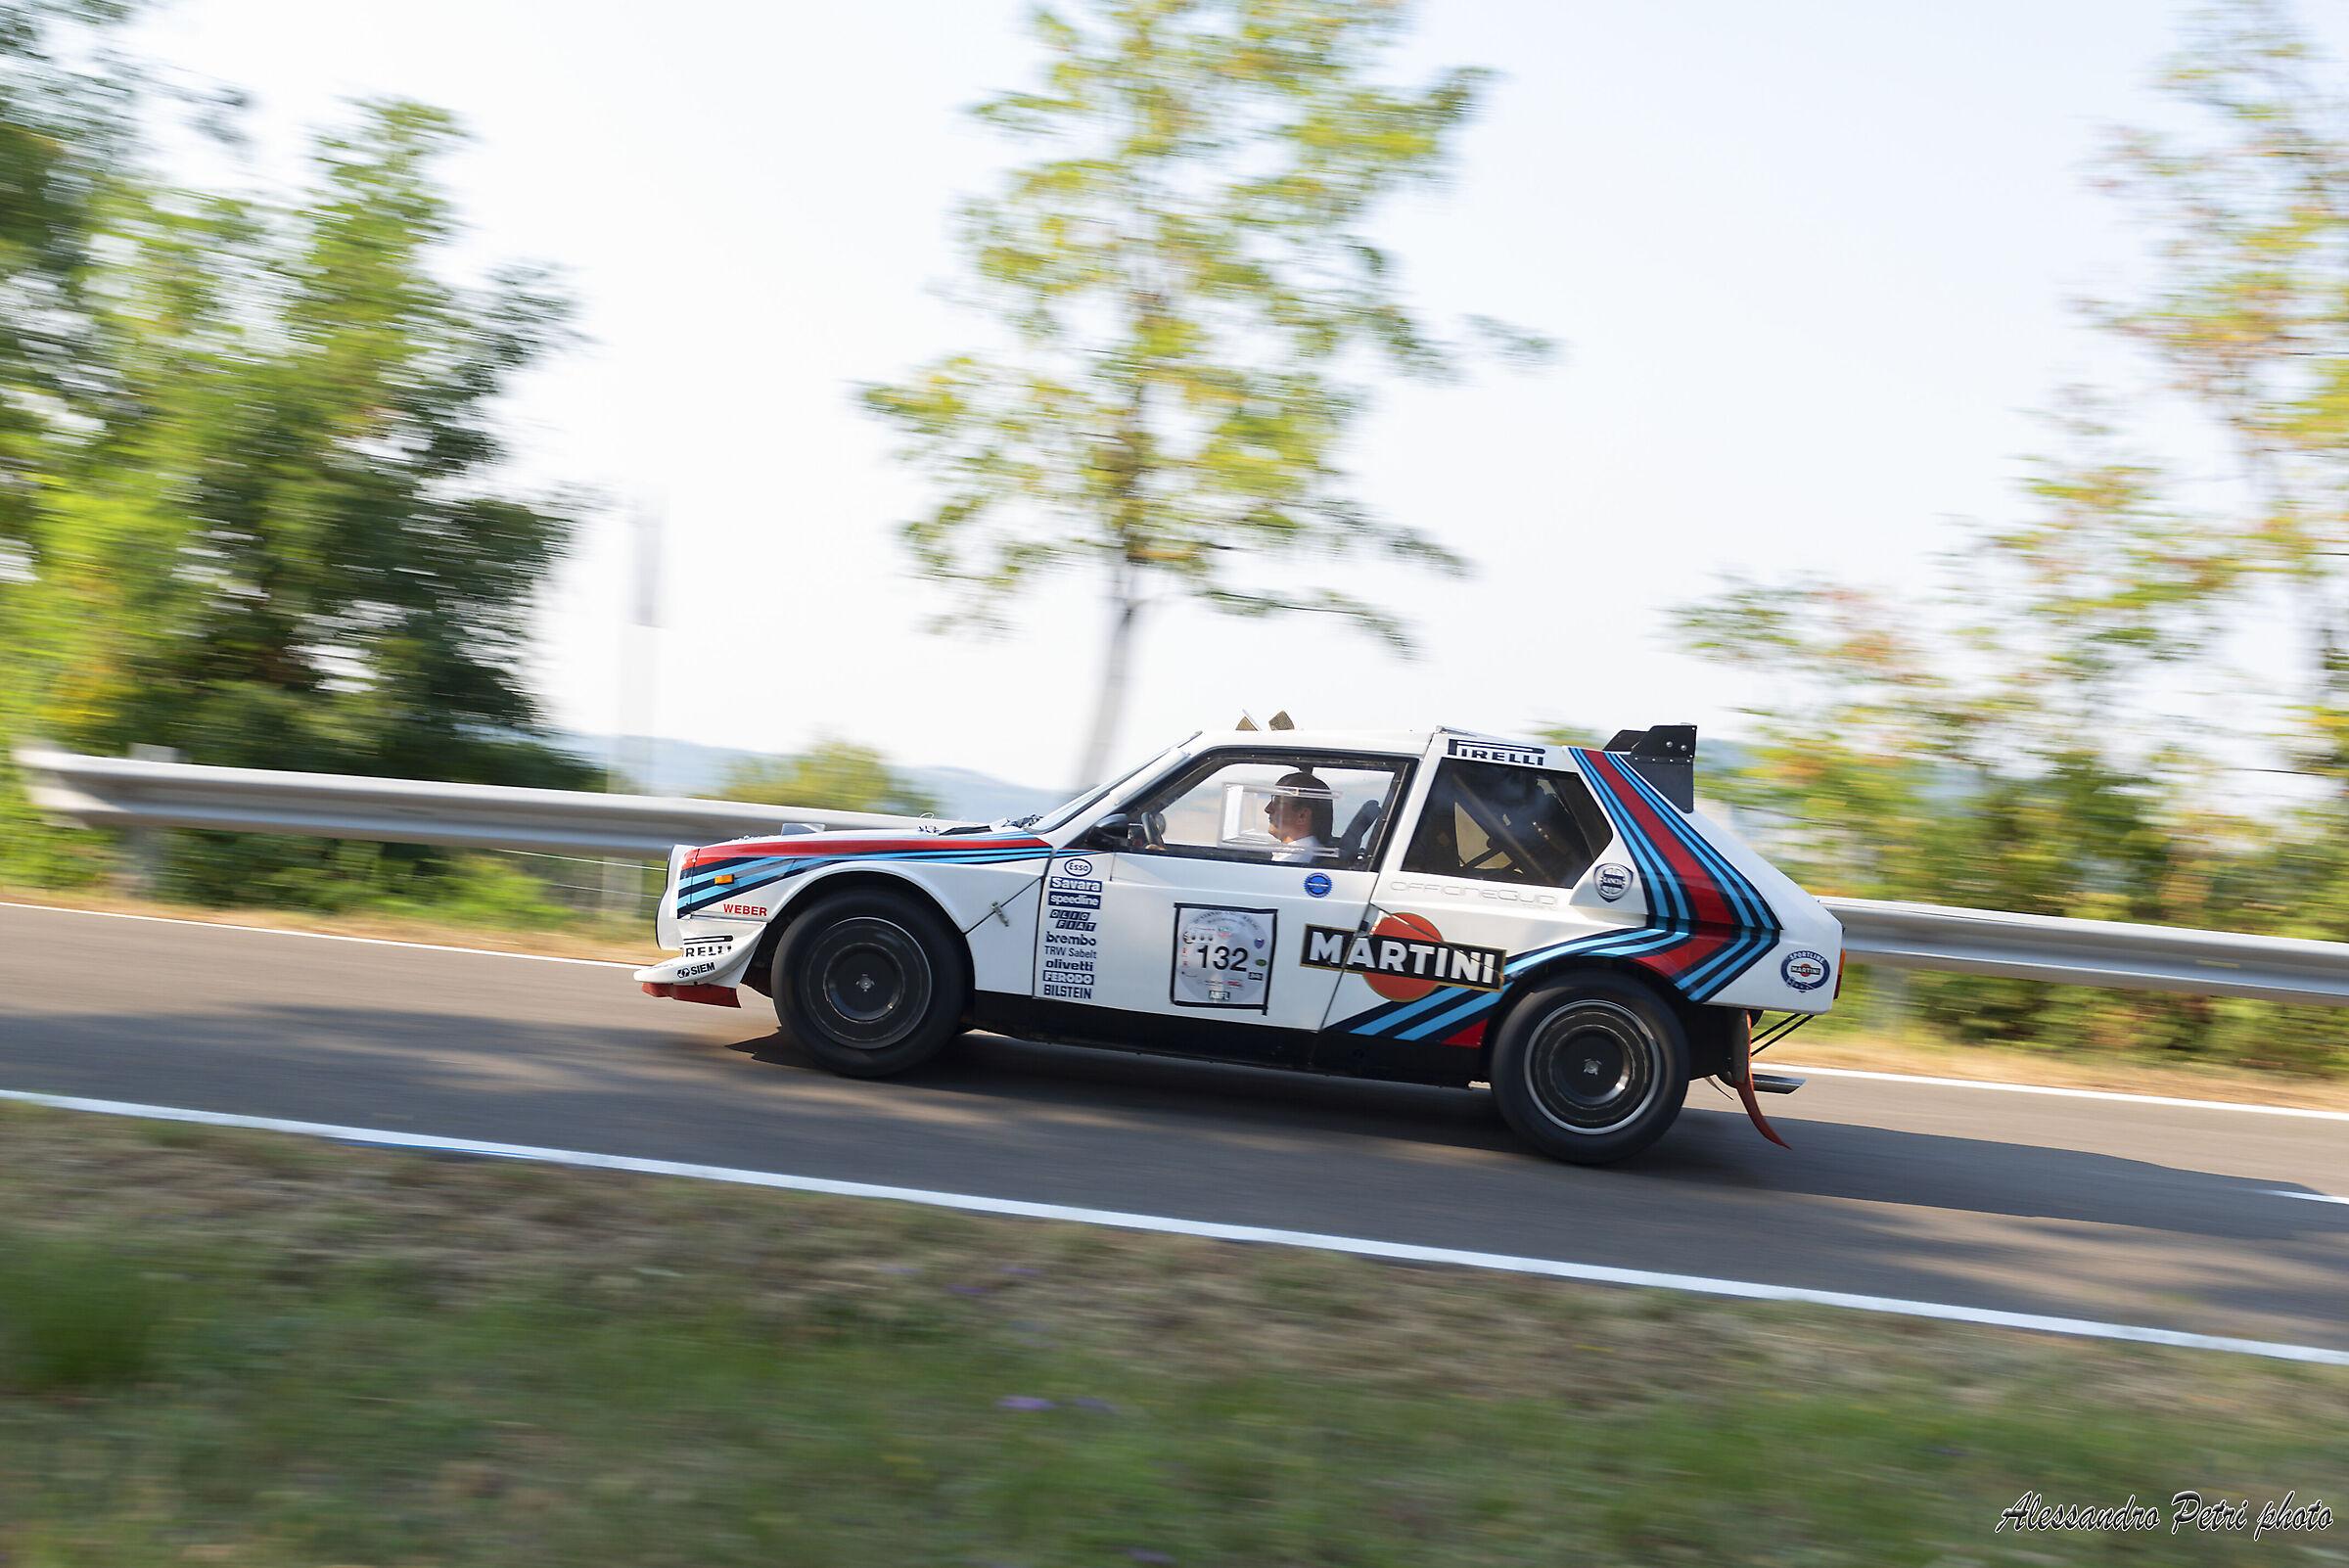 Lancia Delta S4...